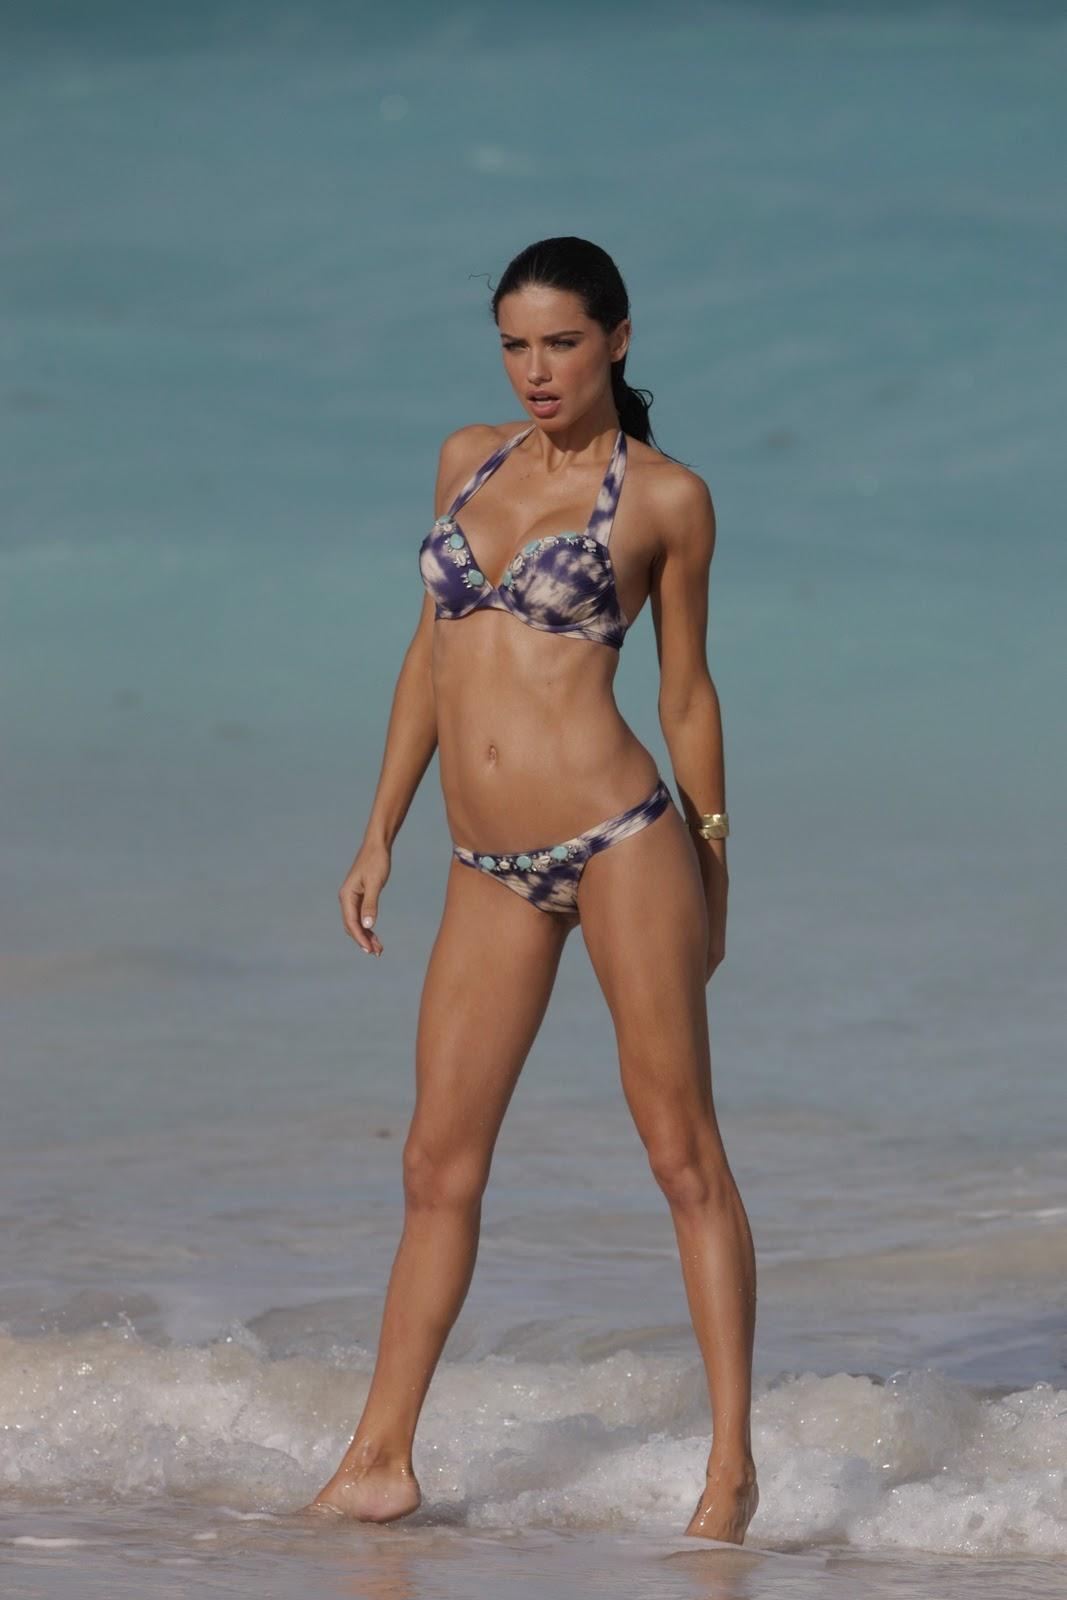 Adriana lima 2012 victoria039s secret beach bombshell advert 5